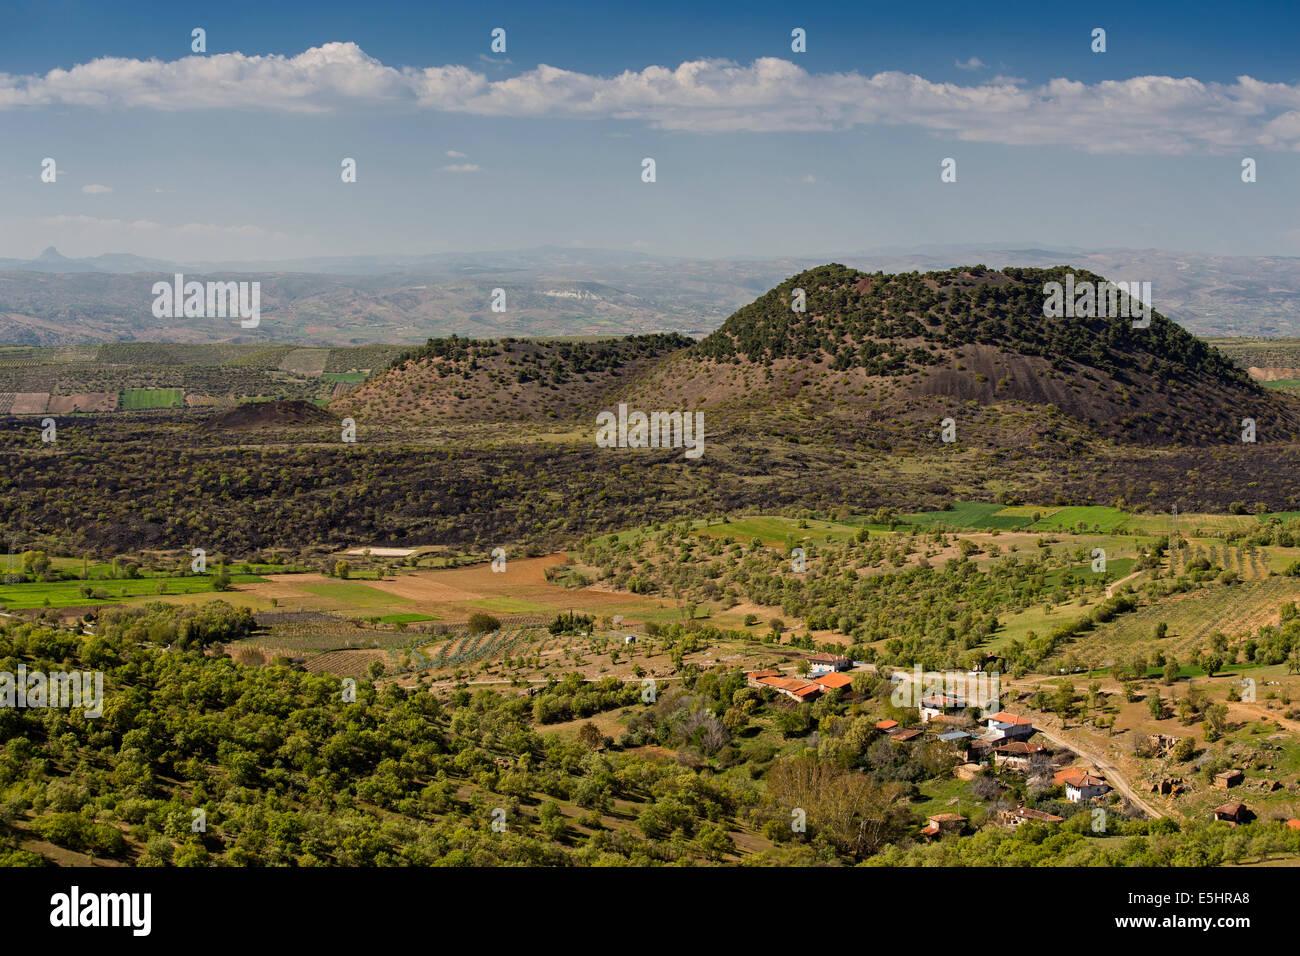 Kula Vulkankegel geologischer Park Manisa Türkei Stockbild